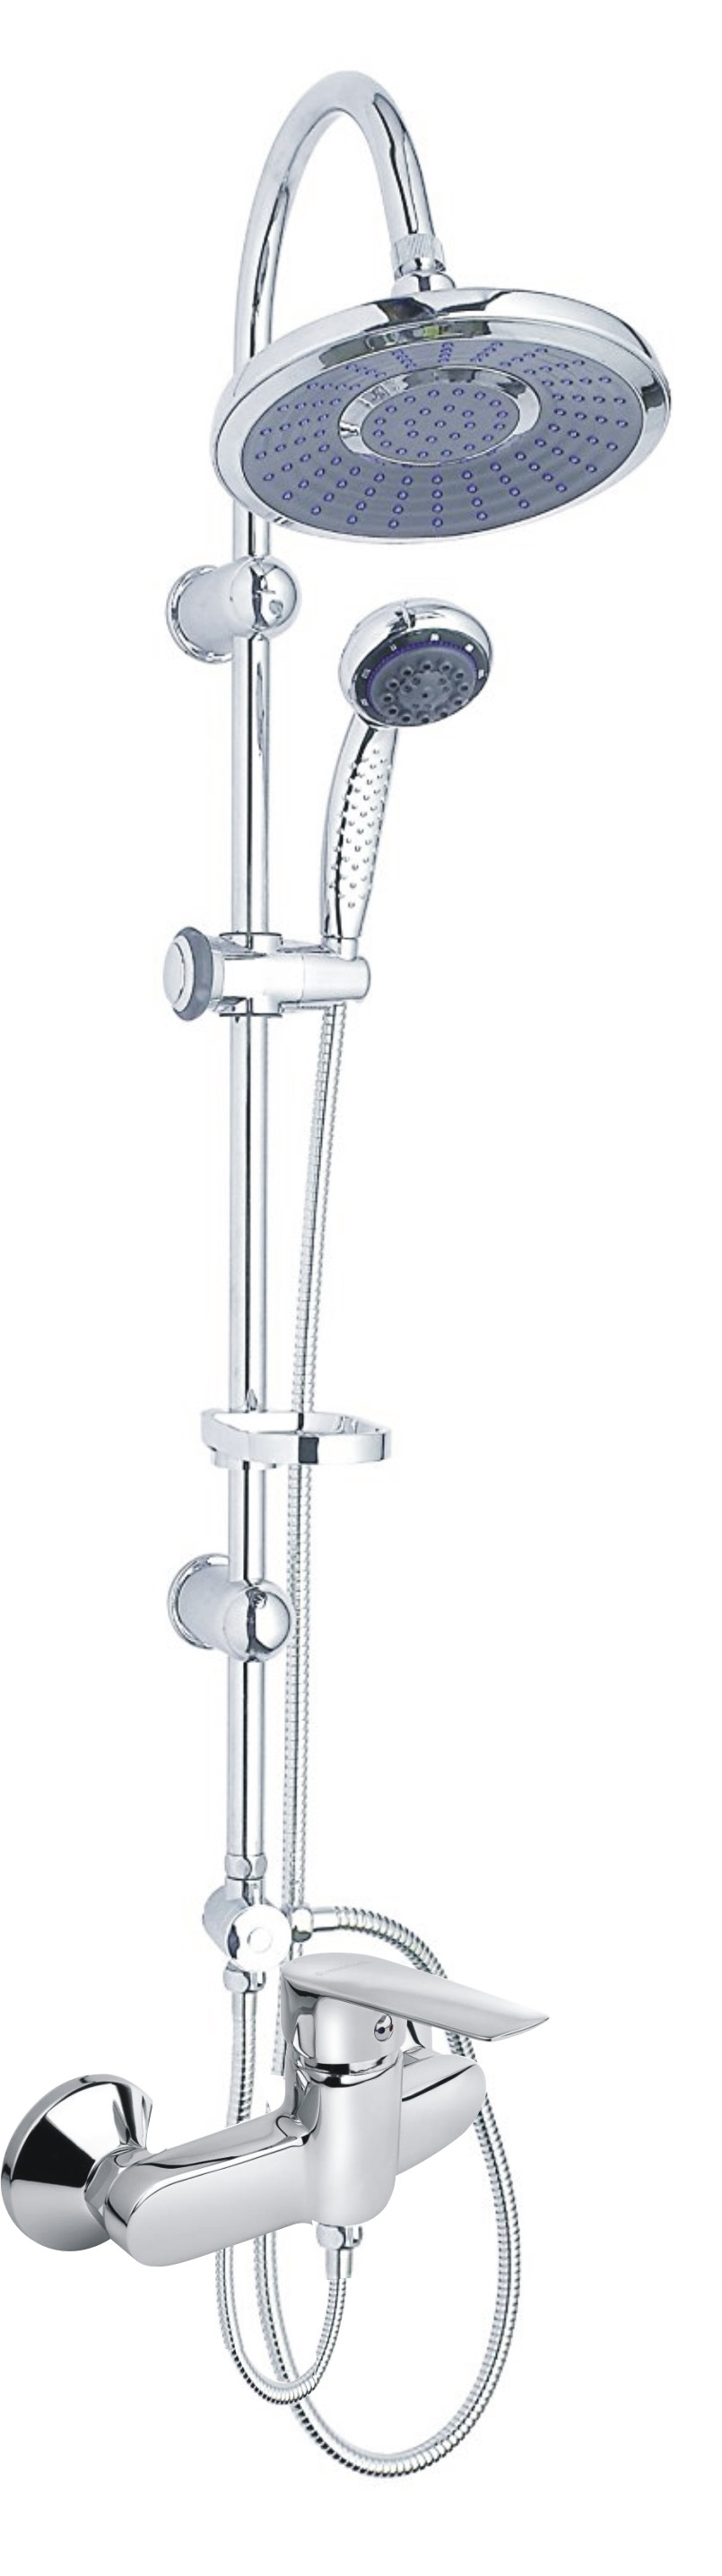 SUNNY VIOLENT Well Sprchový set se sprchovou baterií, skladem